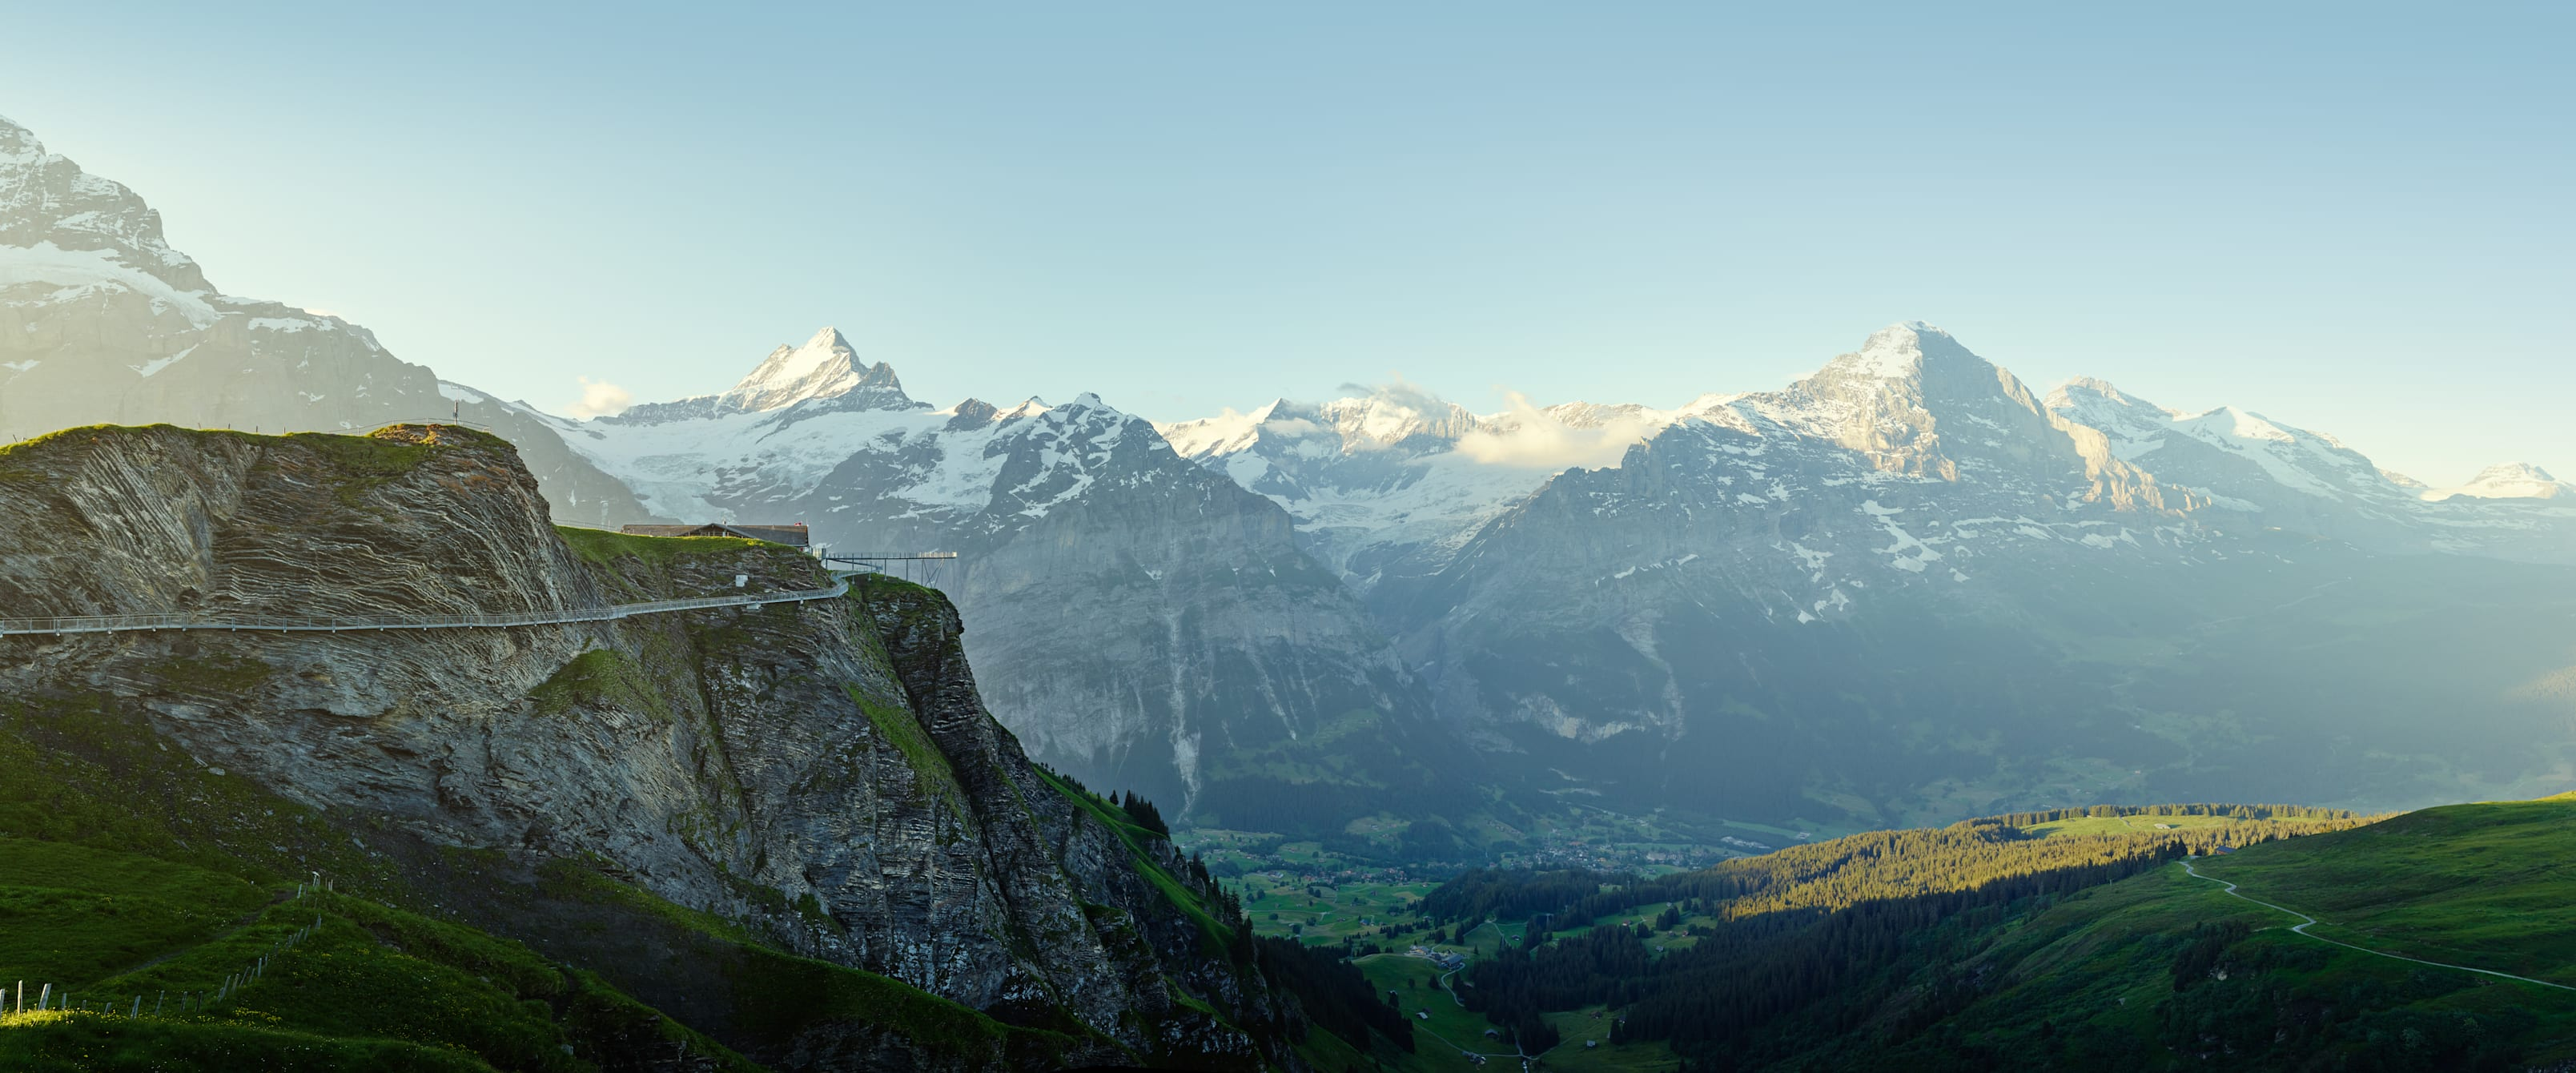 Grindelwald First Sommer Cliff Walk Eiger Moench Jungfrau